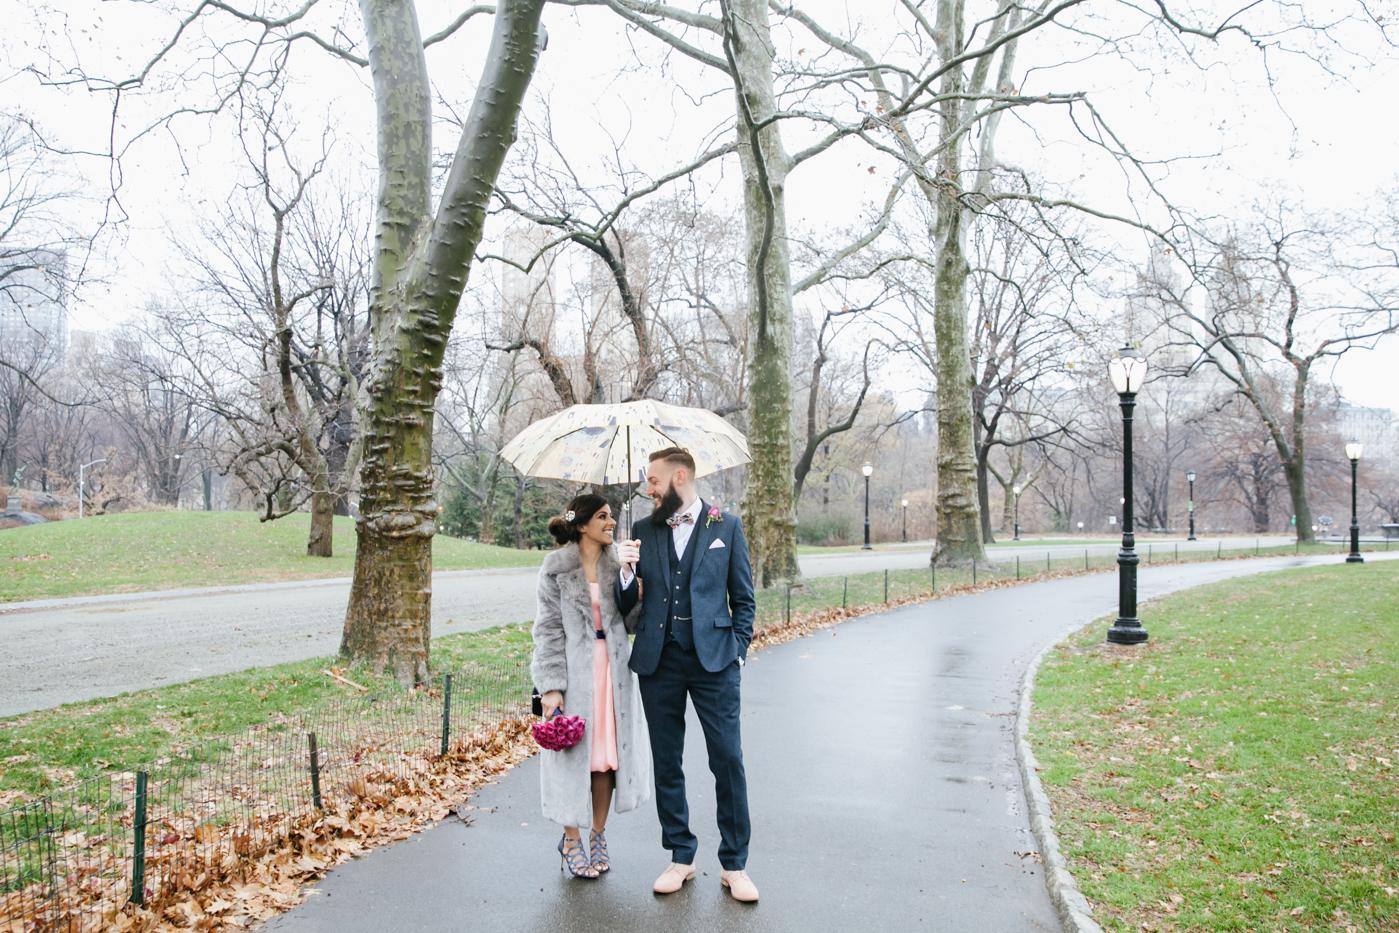 Central-park-wedding-by-Tanya-Isaeva-71.jpg